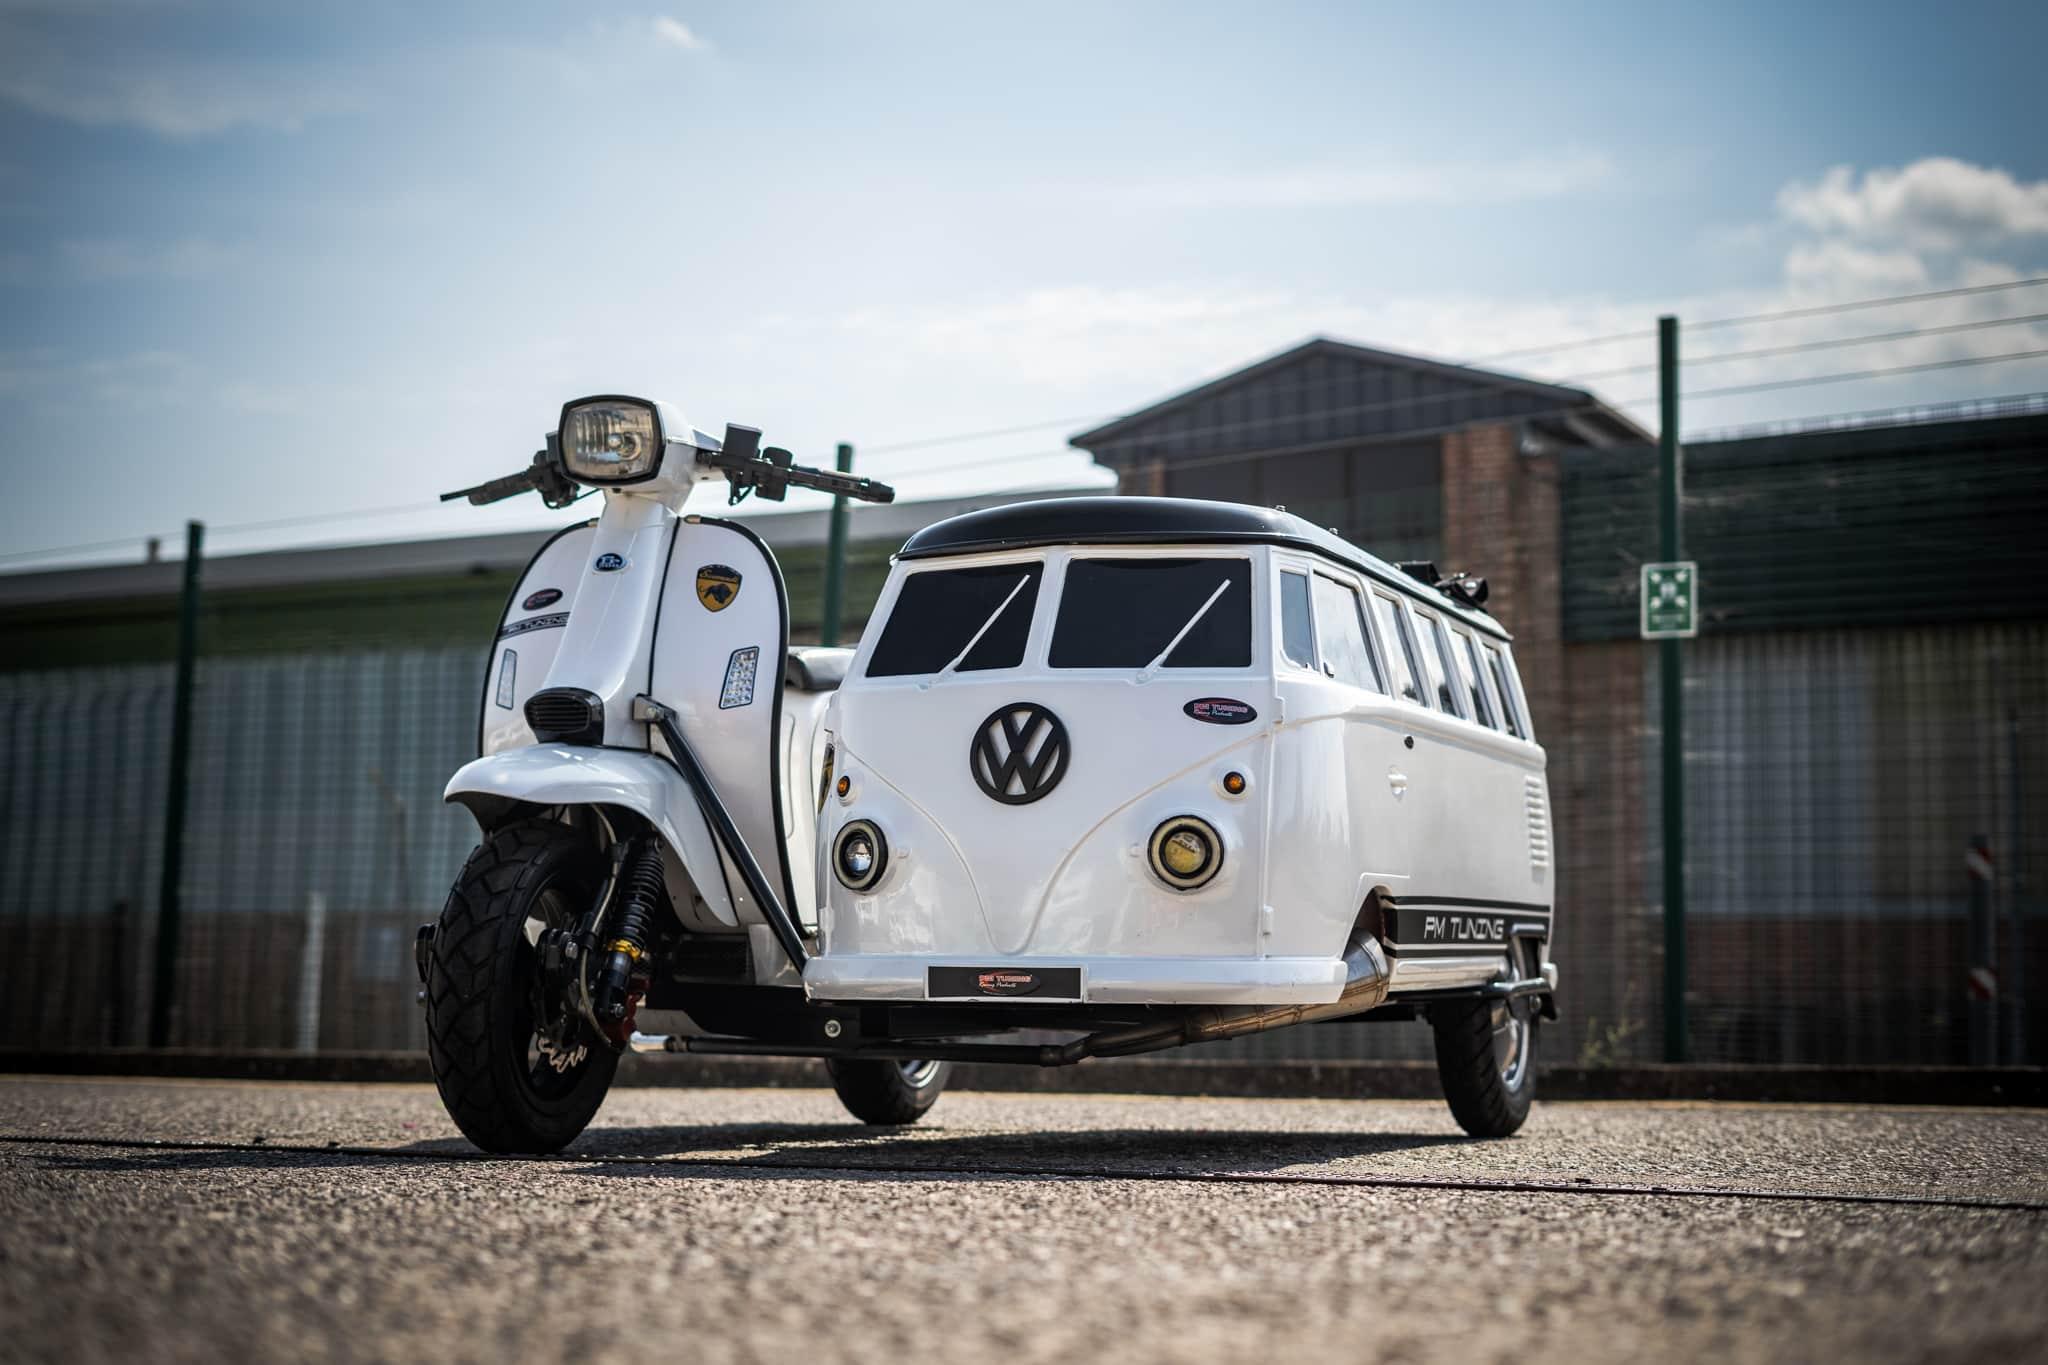 Scomadi FP 200 and VW Splitscreen Sidecar with custom trailer - Bonkers!  2nd Aug